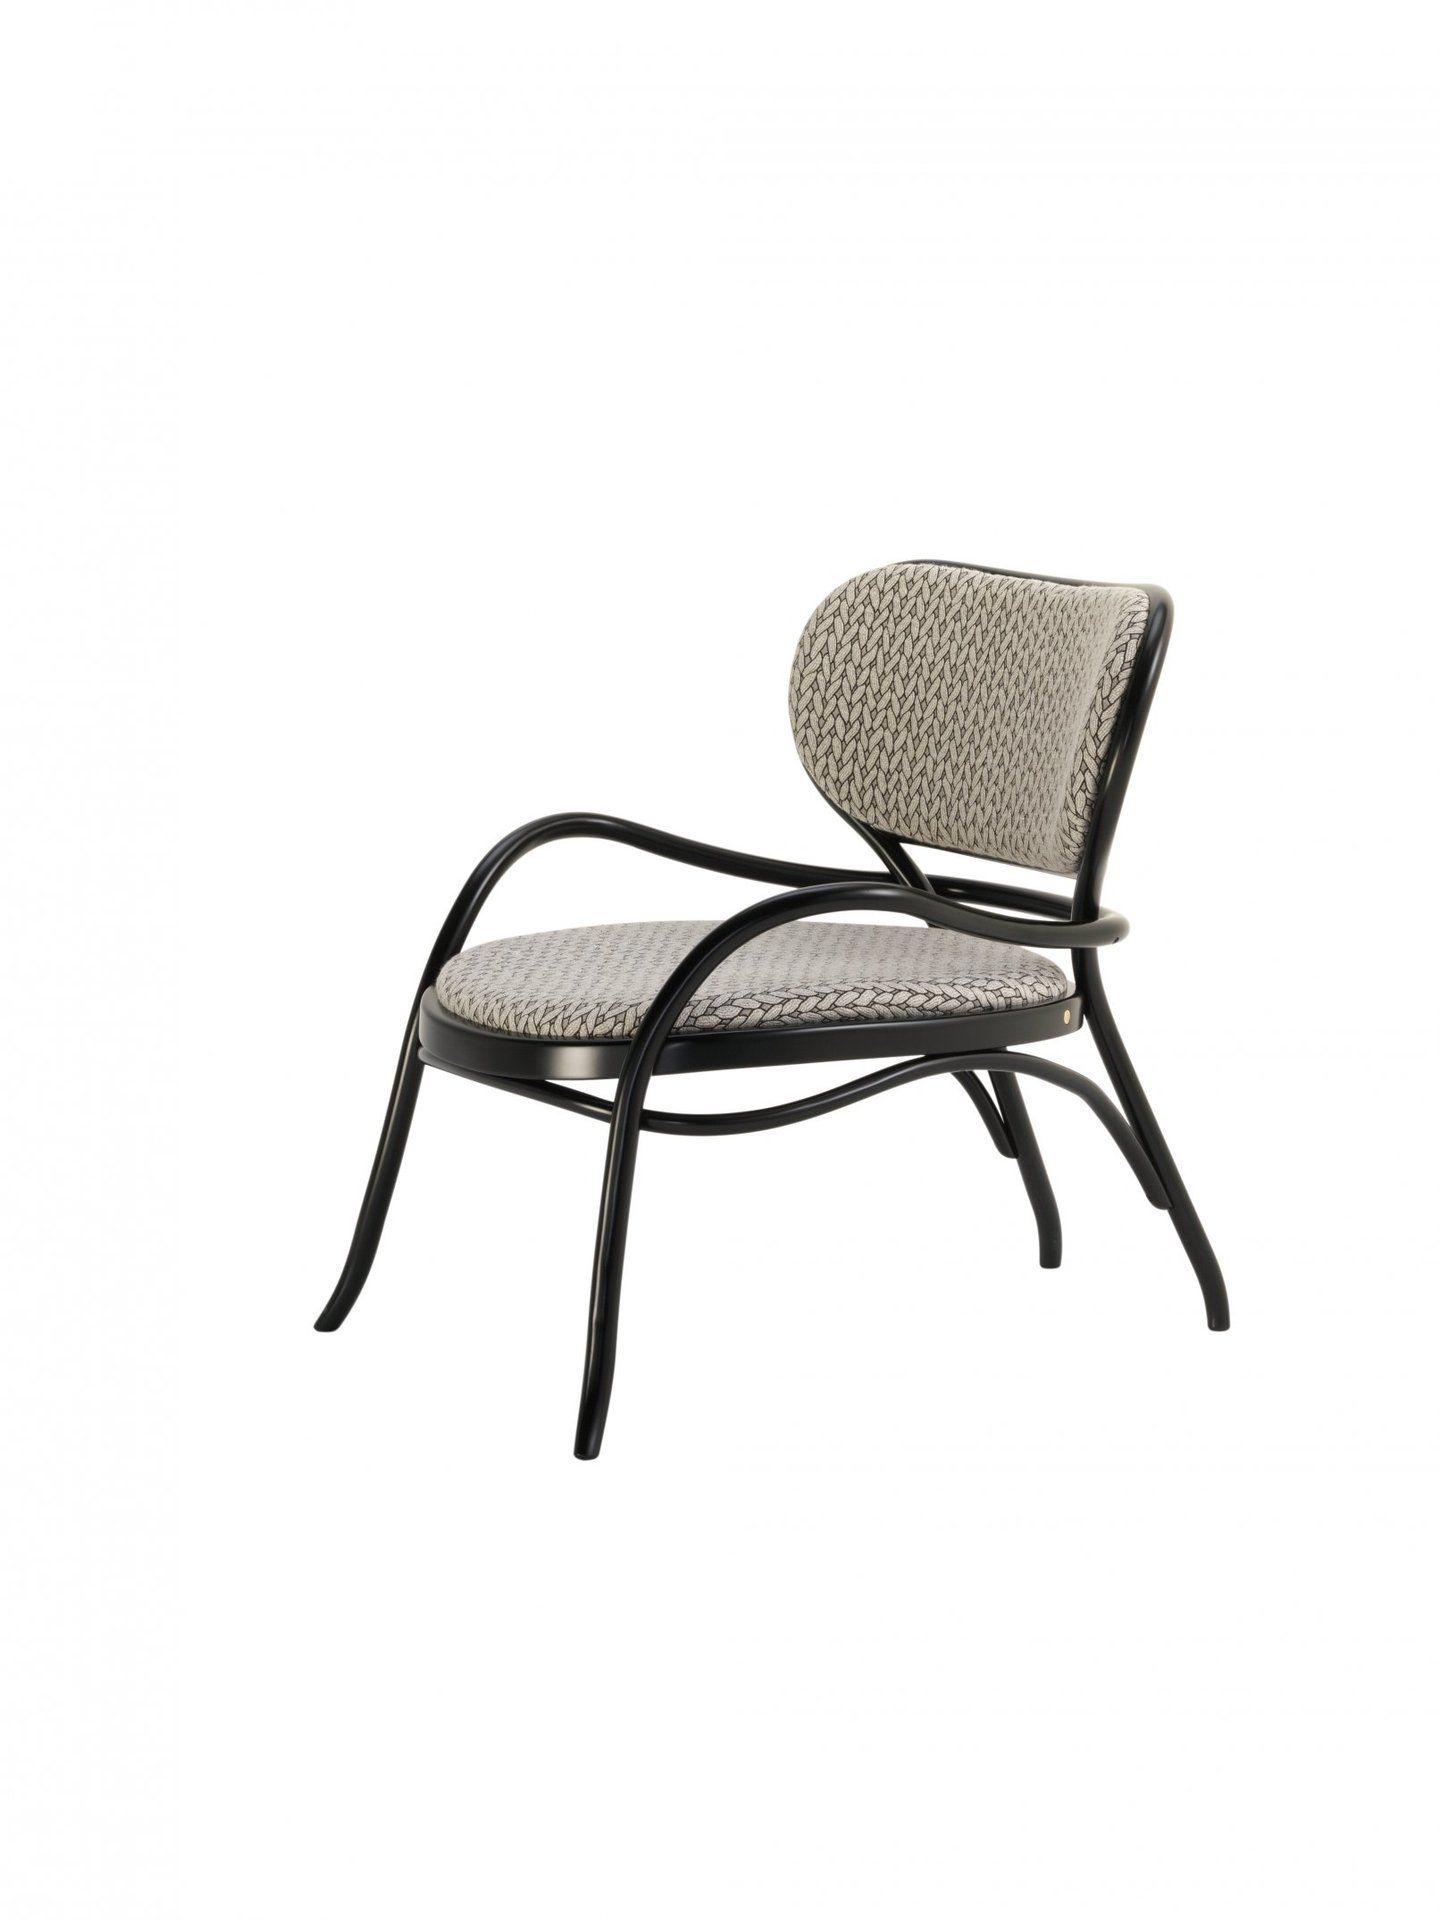 Lehnstuhl Furniture Seating